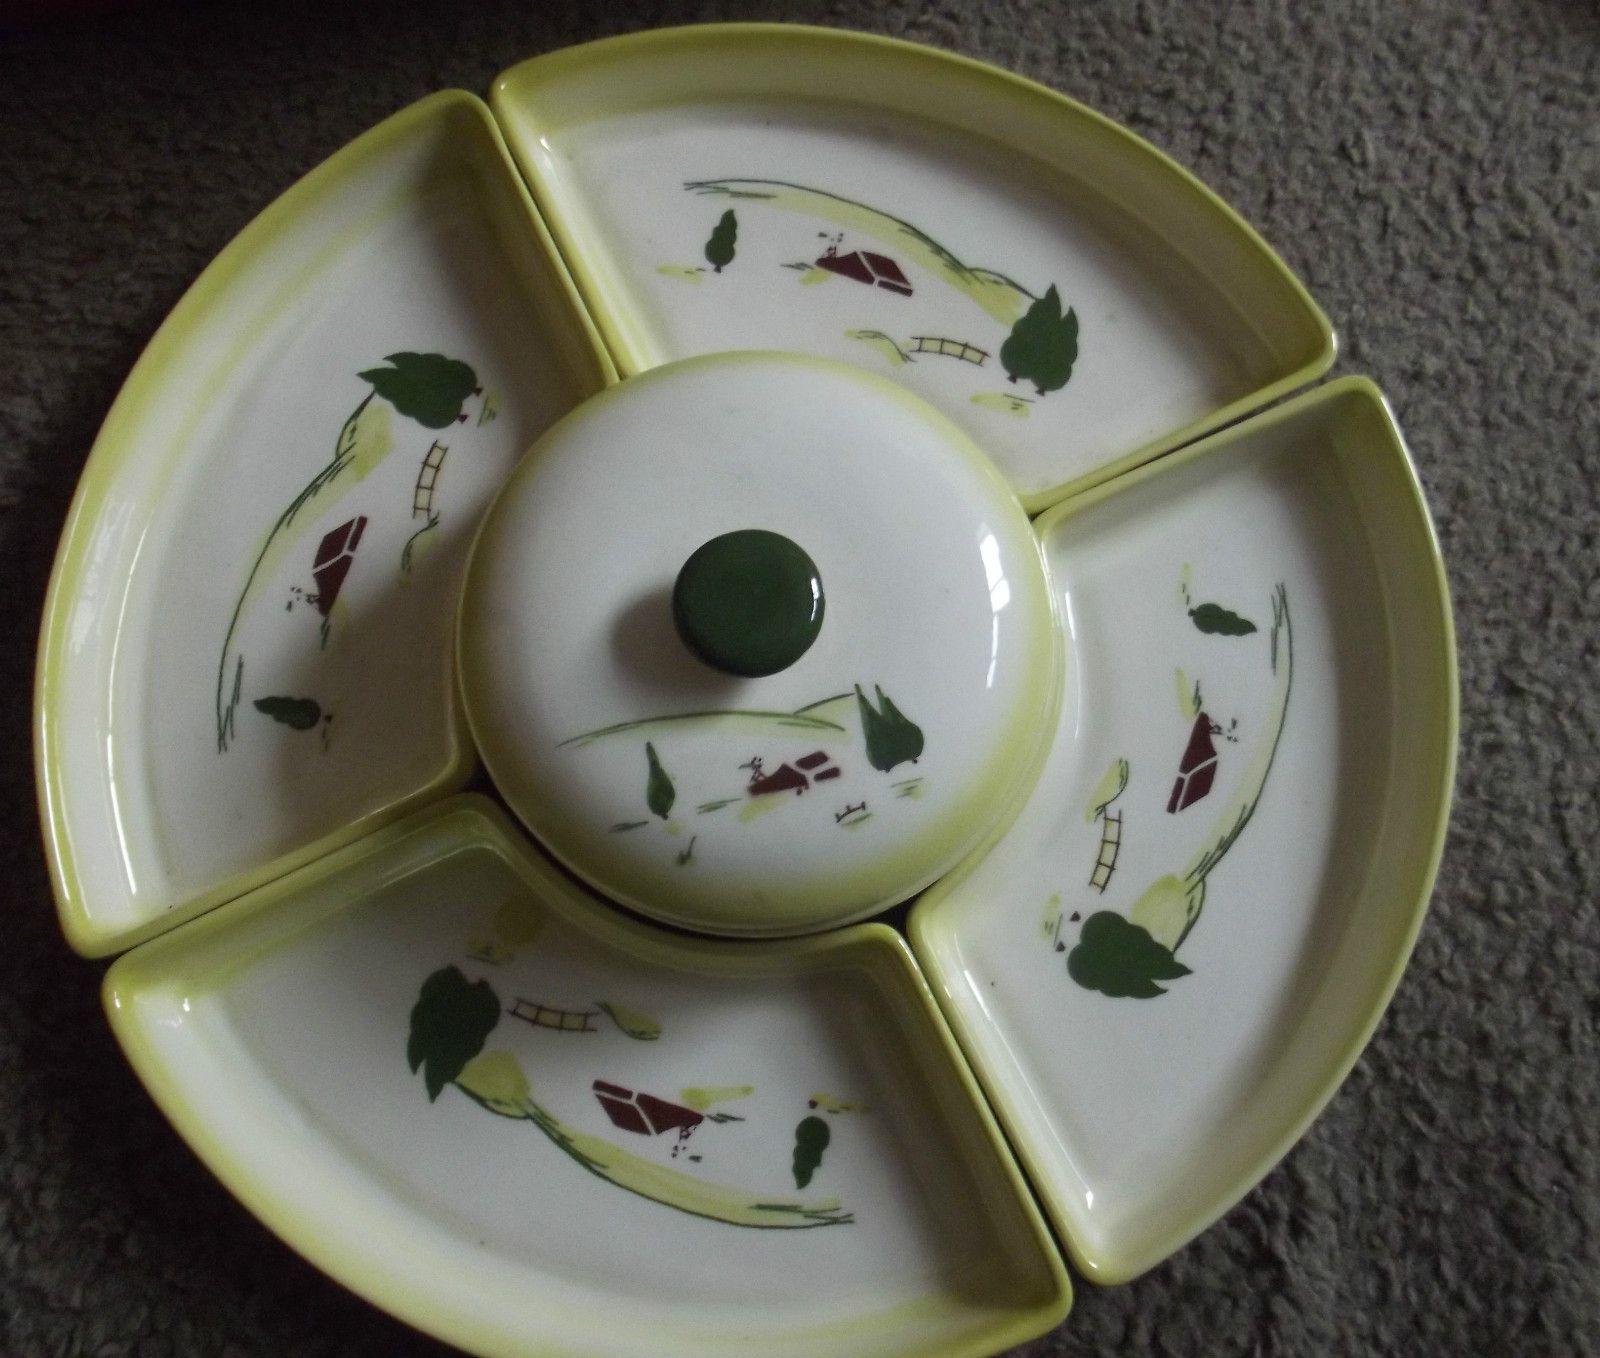 Vintage Brock of California Harvest Farmhouse Dinner Plates